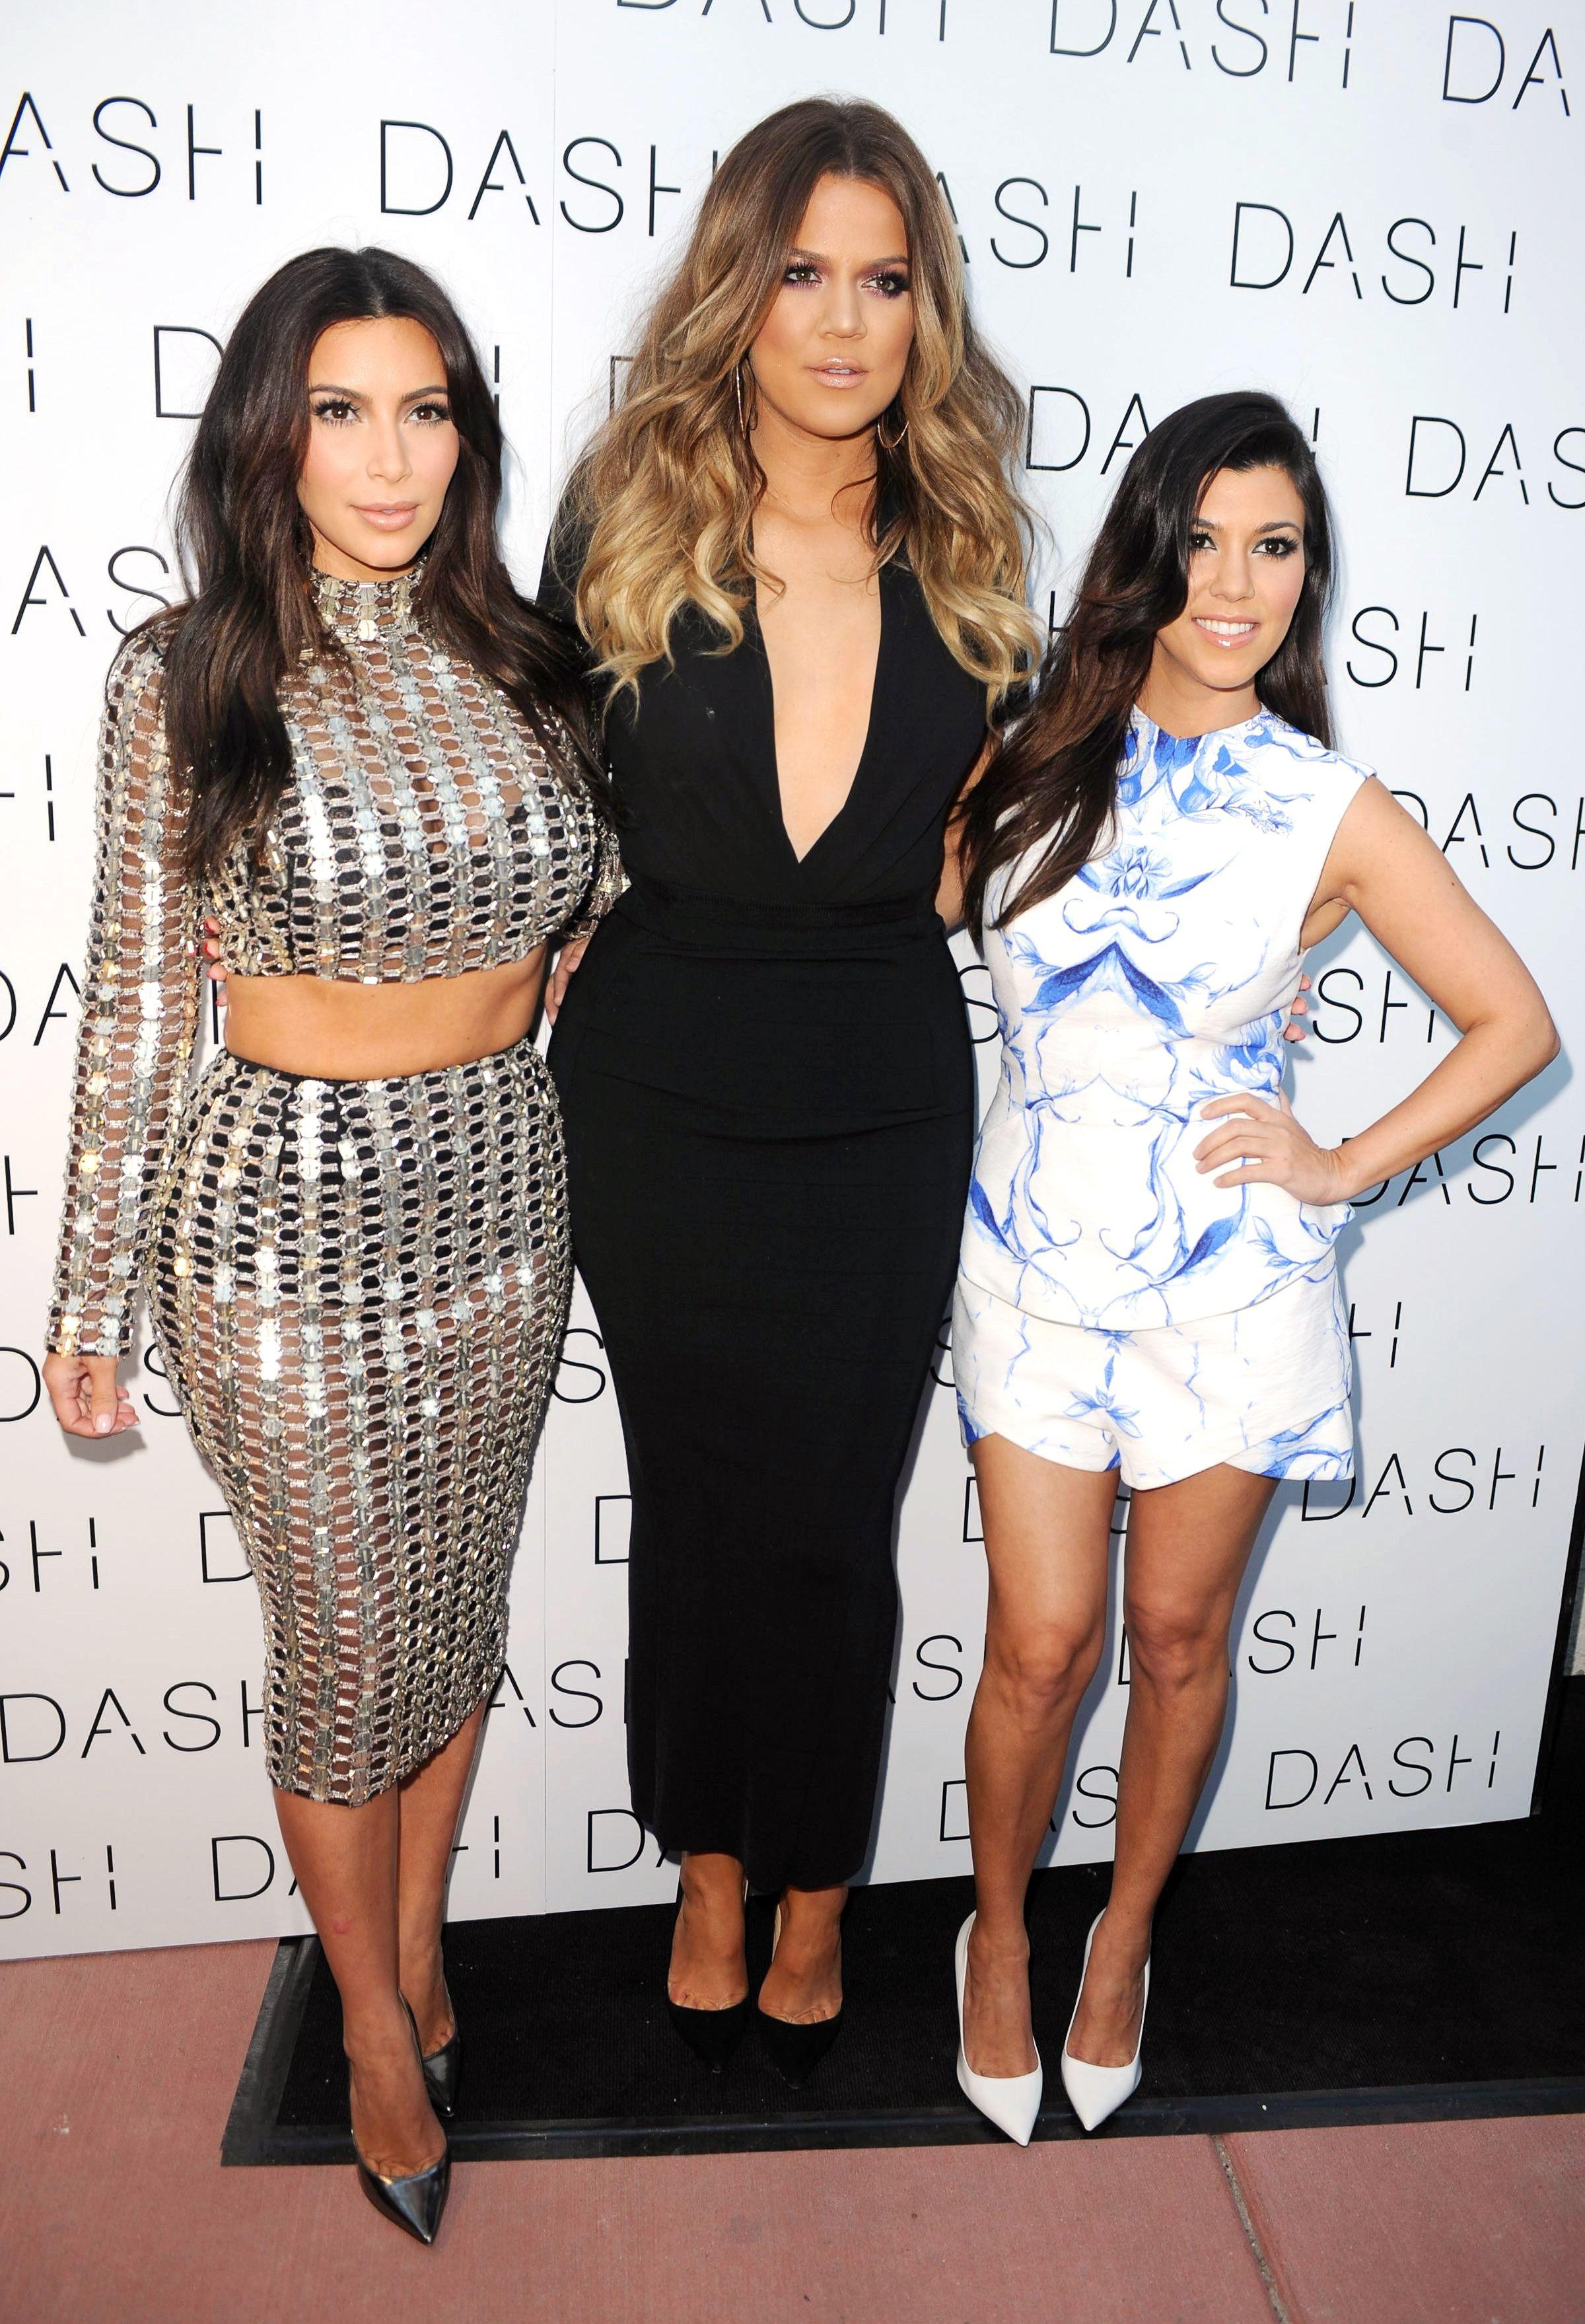 Kim Kardashian, Khloé Kardashian and Kourtney Kardashian